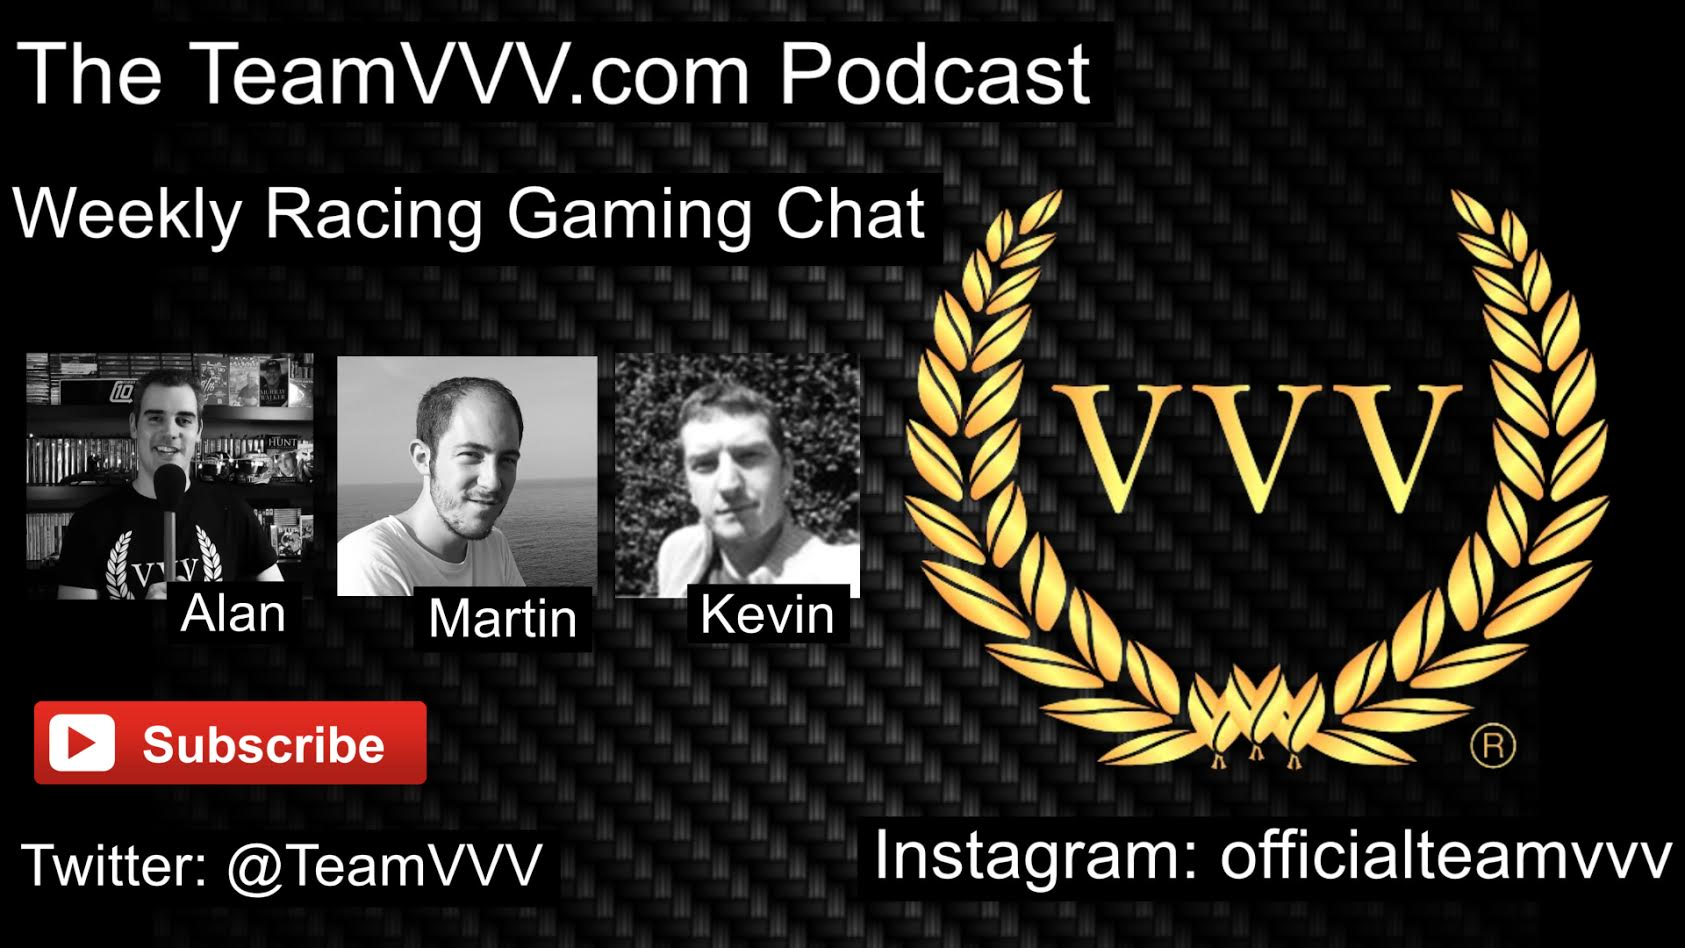 The TeamVVV Podcast Episode 4 - Chatting Carmageddon